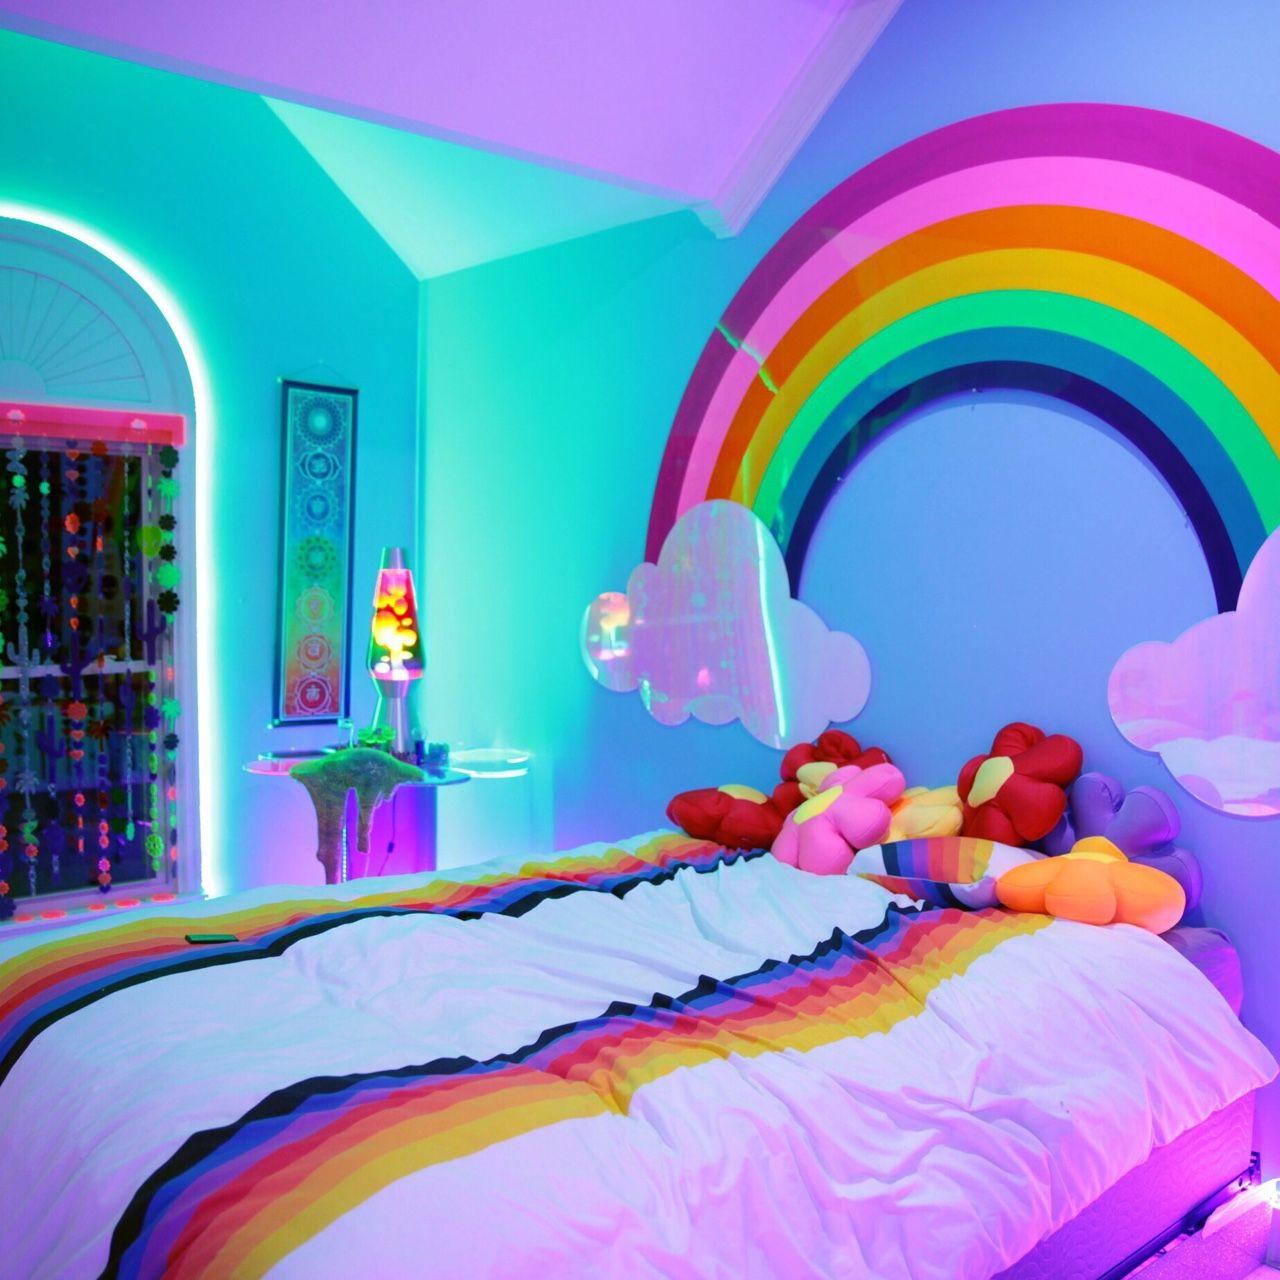 20 Little Girl Room Ideas Decorating Designs For 2018 Rainbow